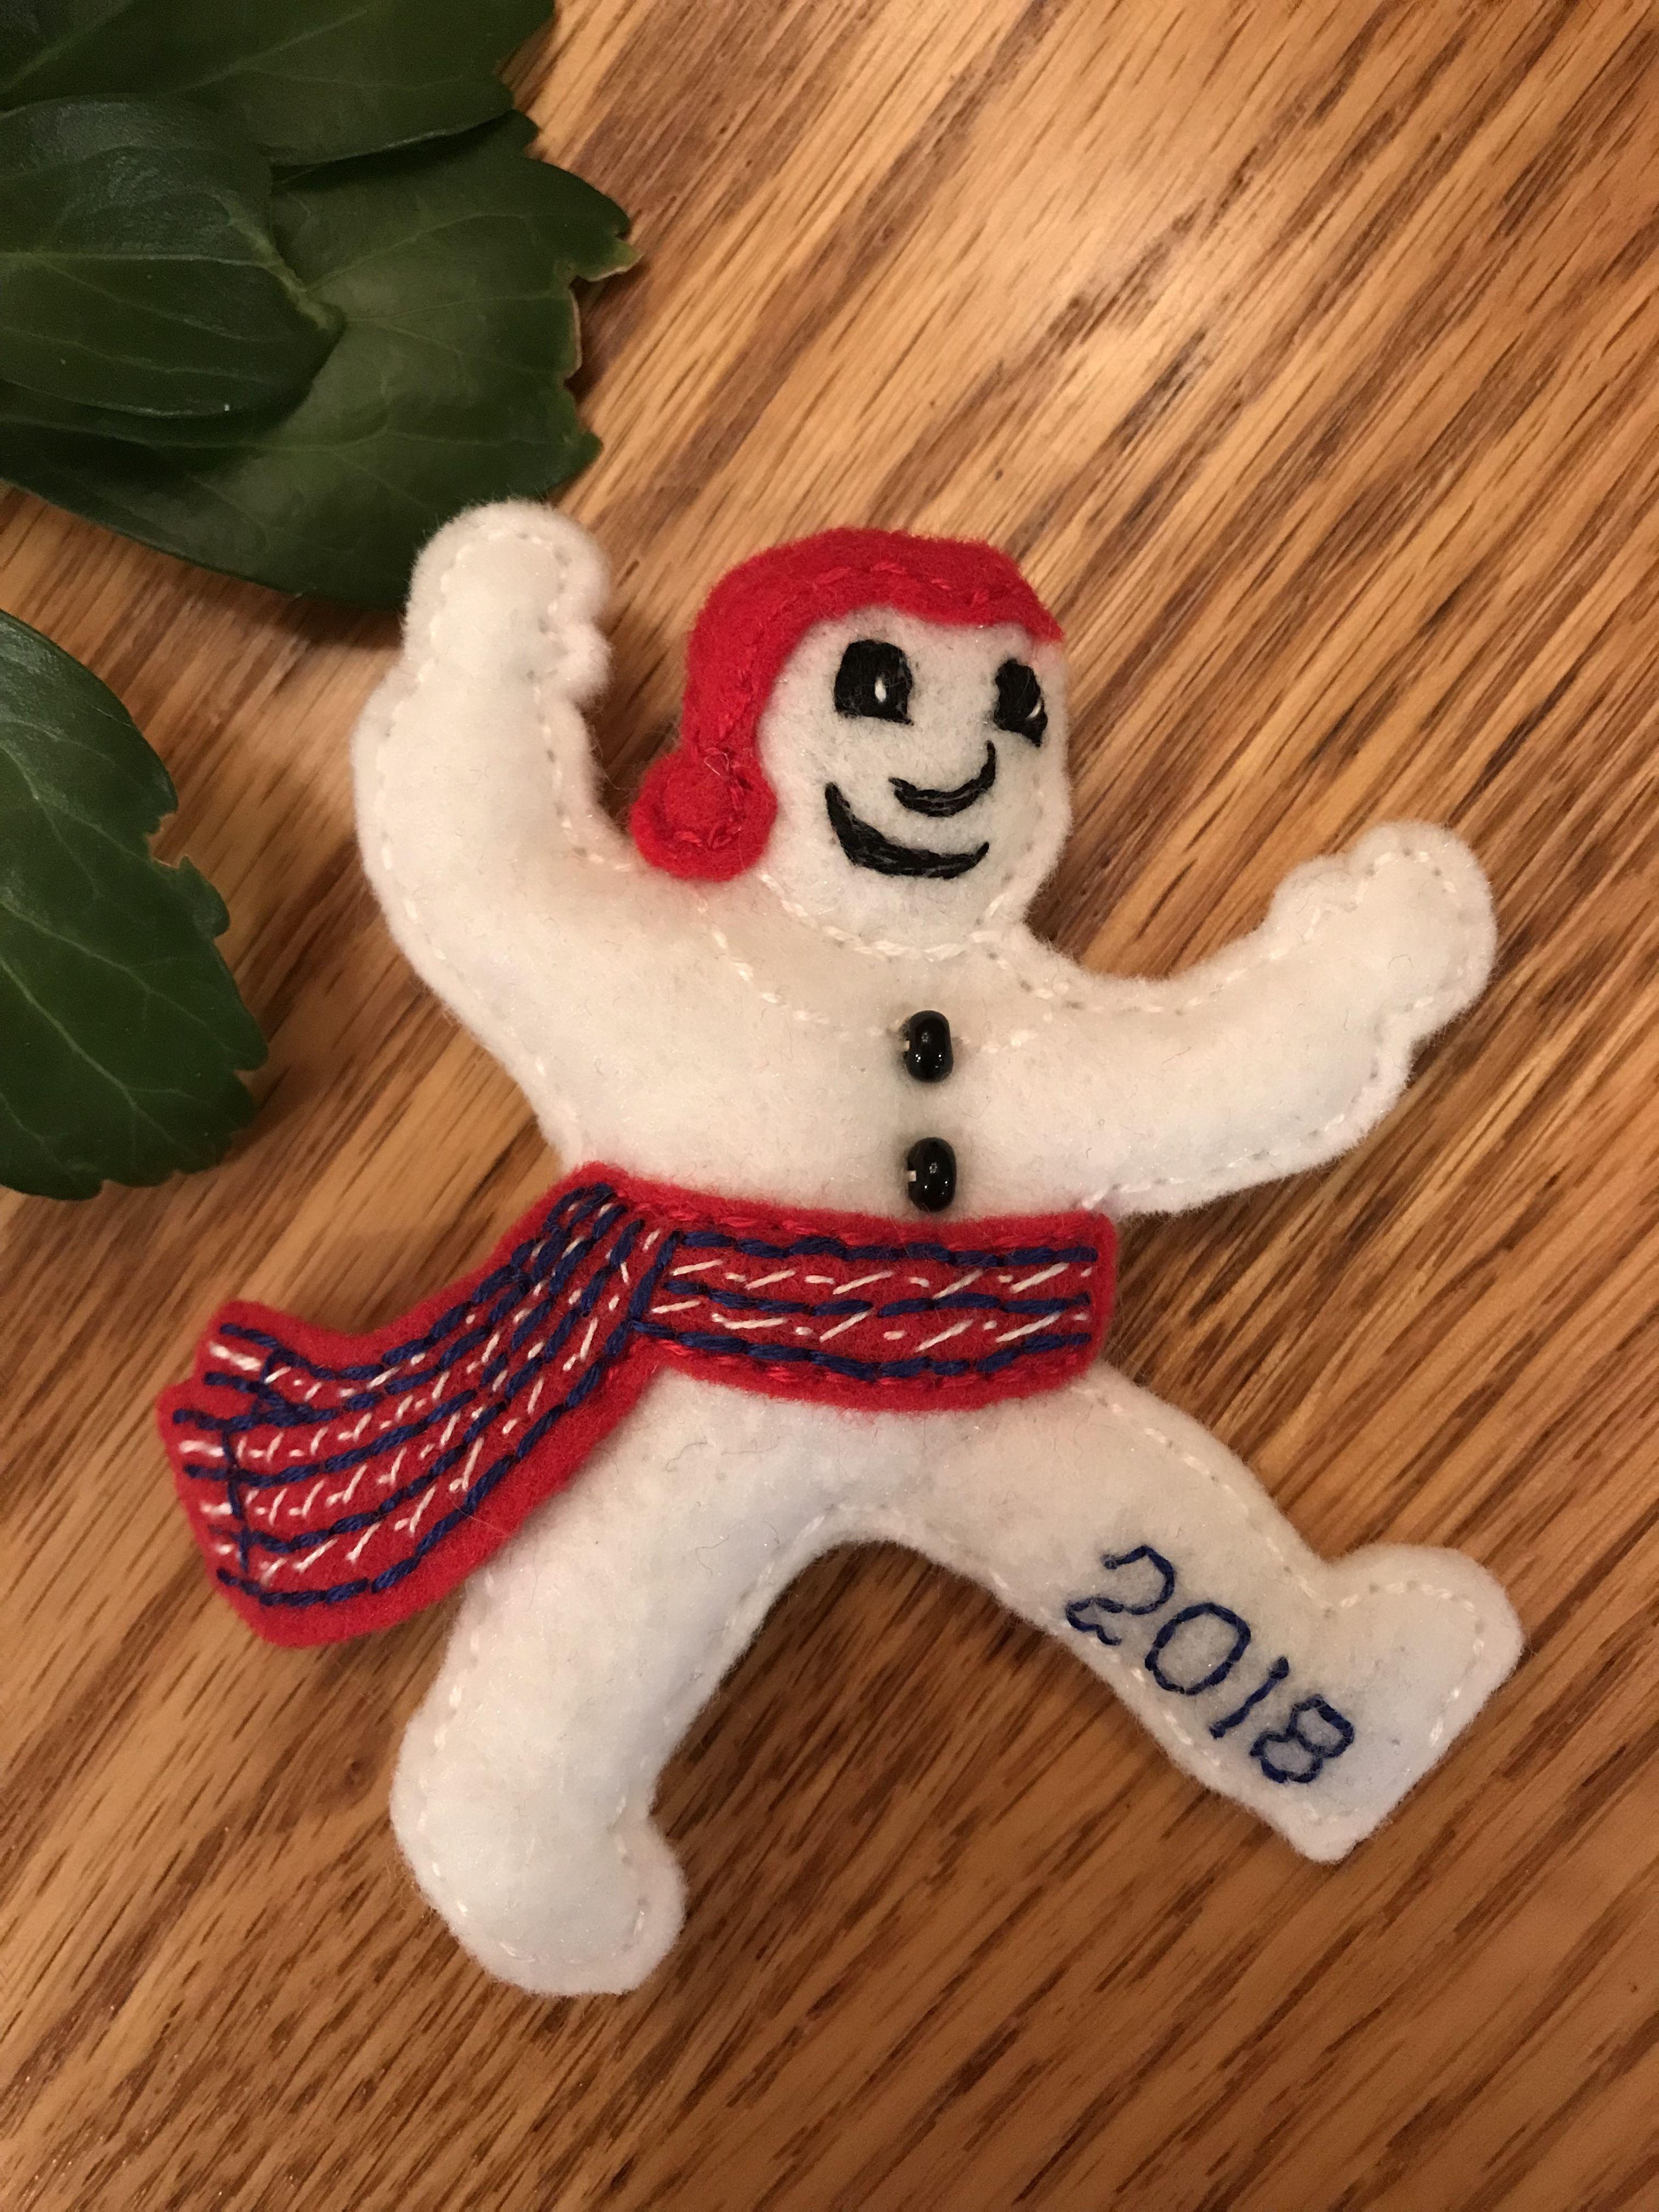 Felt Bonhomme Quebec City Winter Carnival 2018 Christmas Ornaments Crafts Holiday Decor